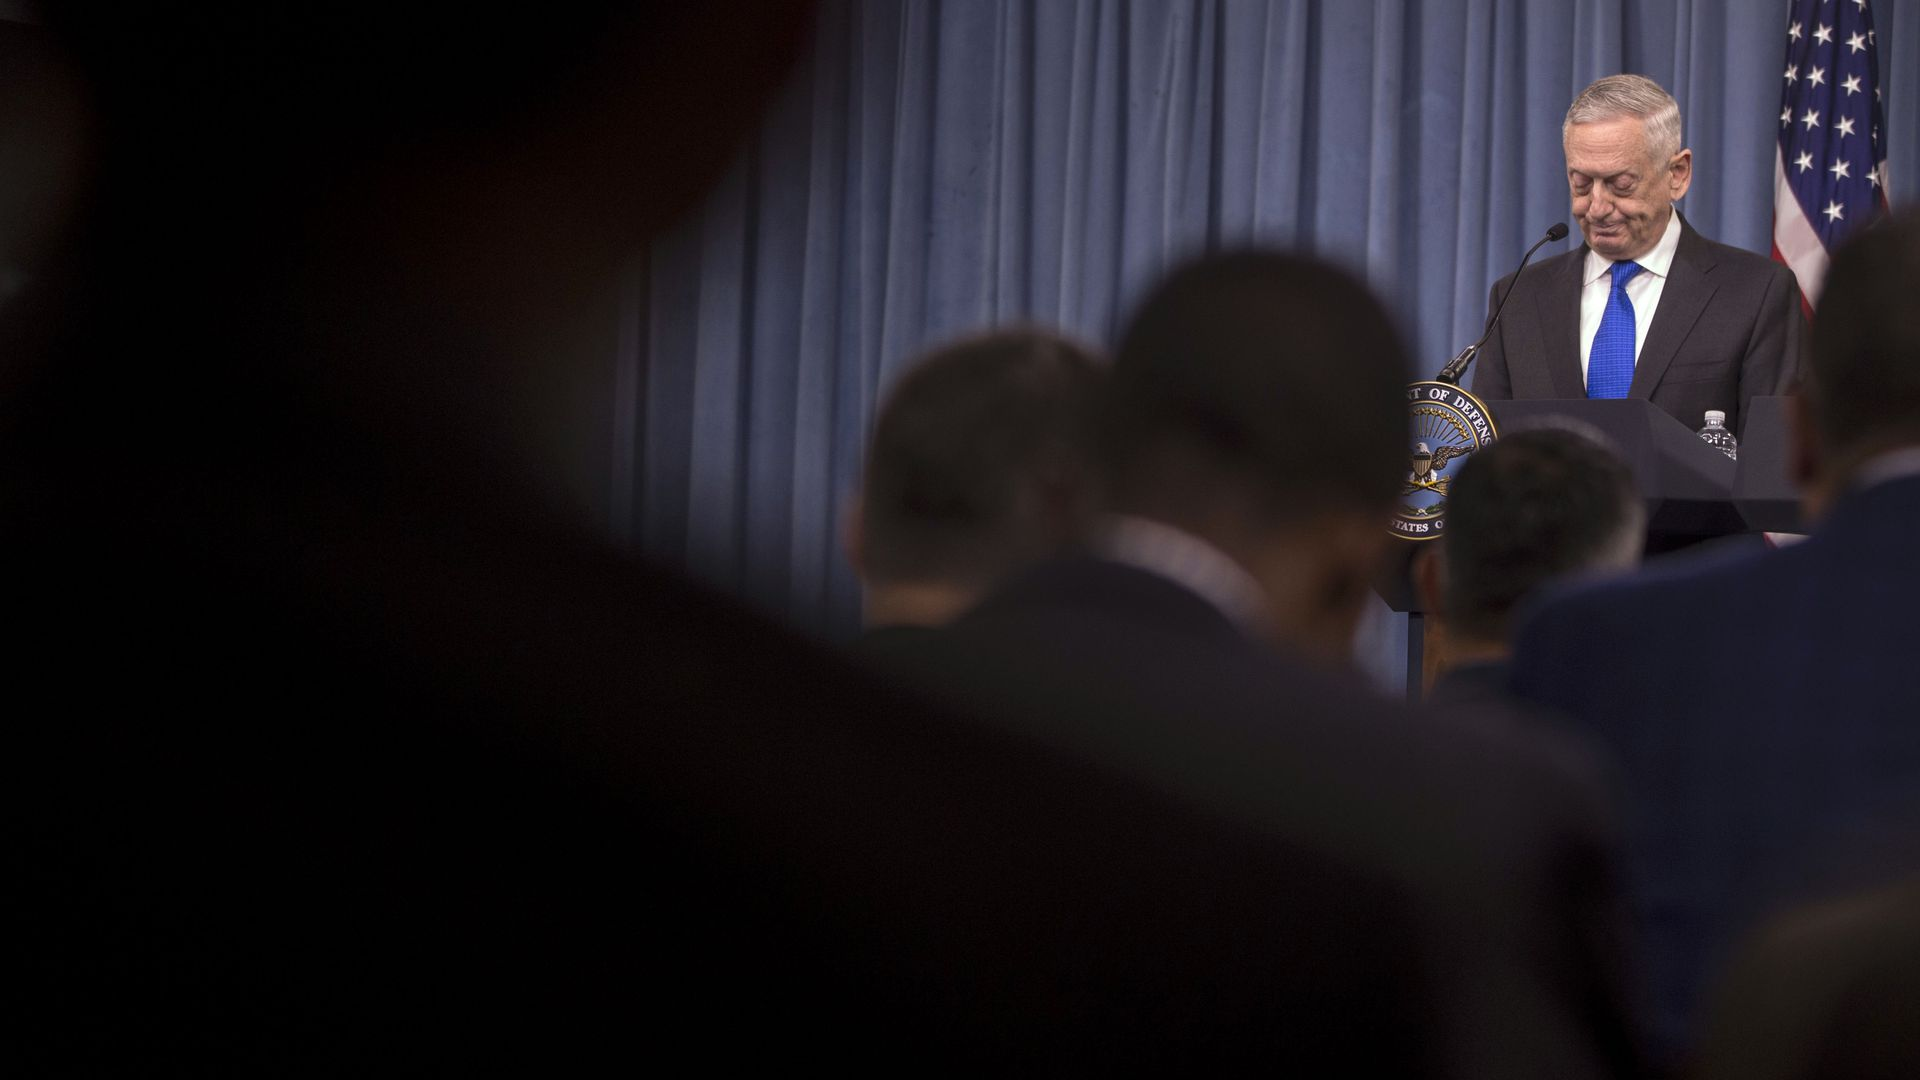 Defense Secretary James Mattis speaks before the press.